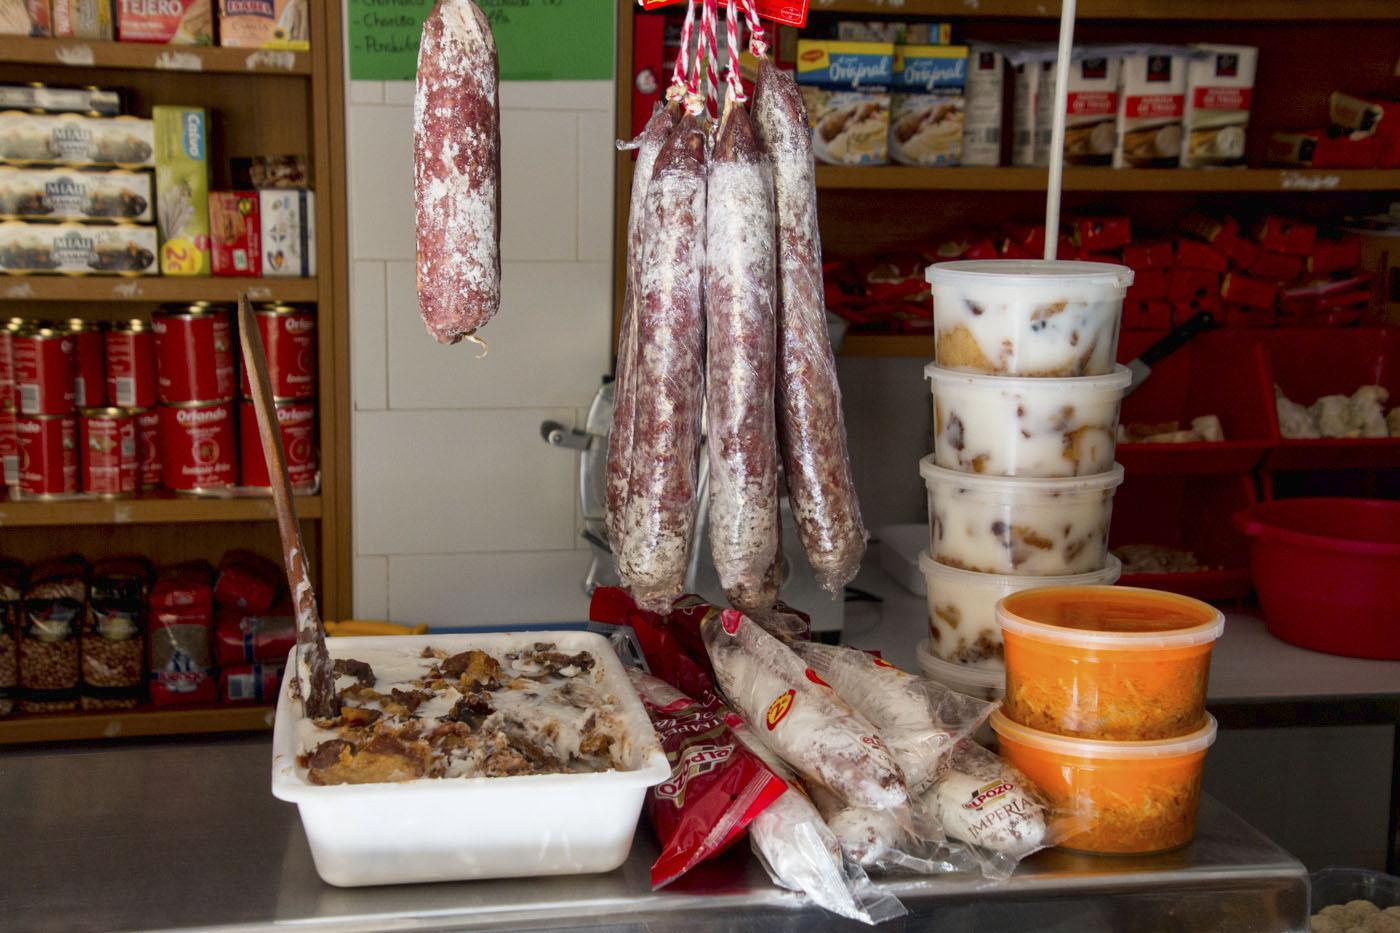 Carnicería Cosme (Casares)